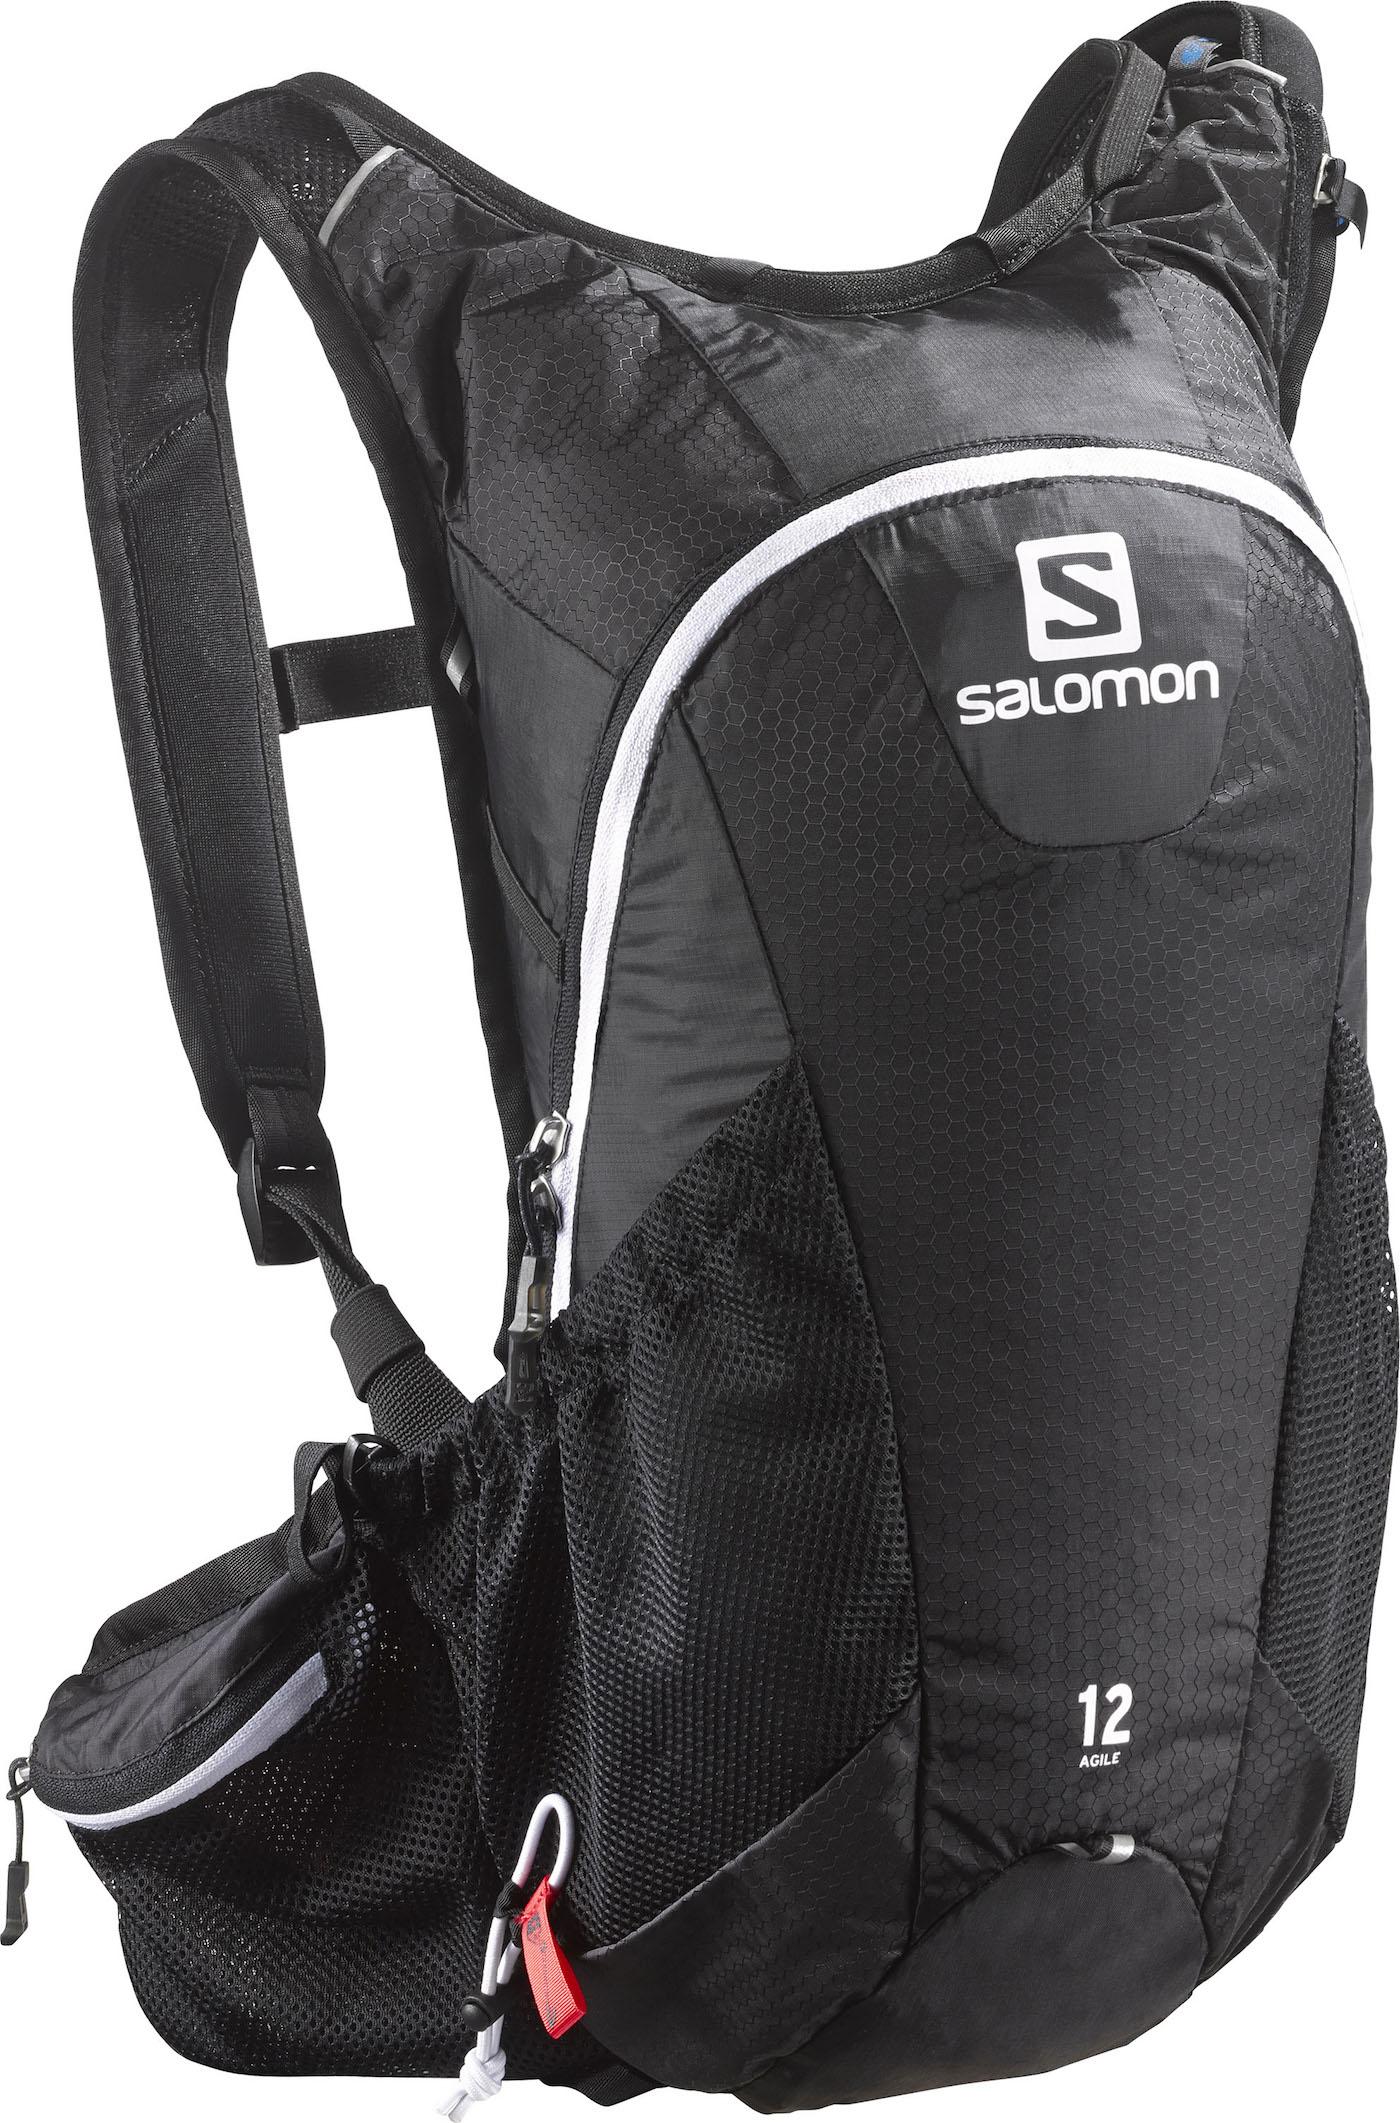 Salomon Agile 12 Set - Laufrucksack